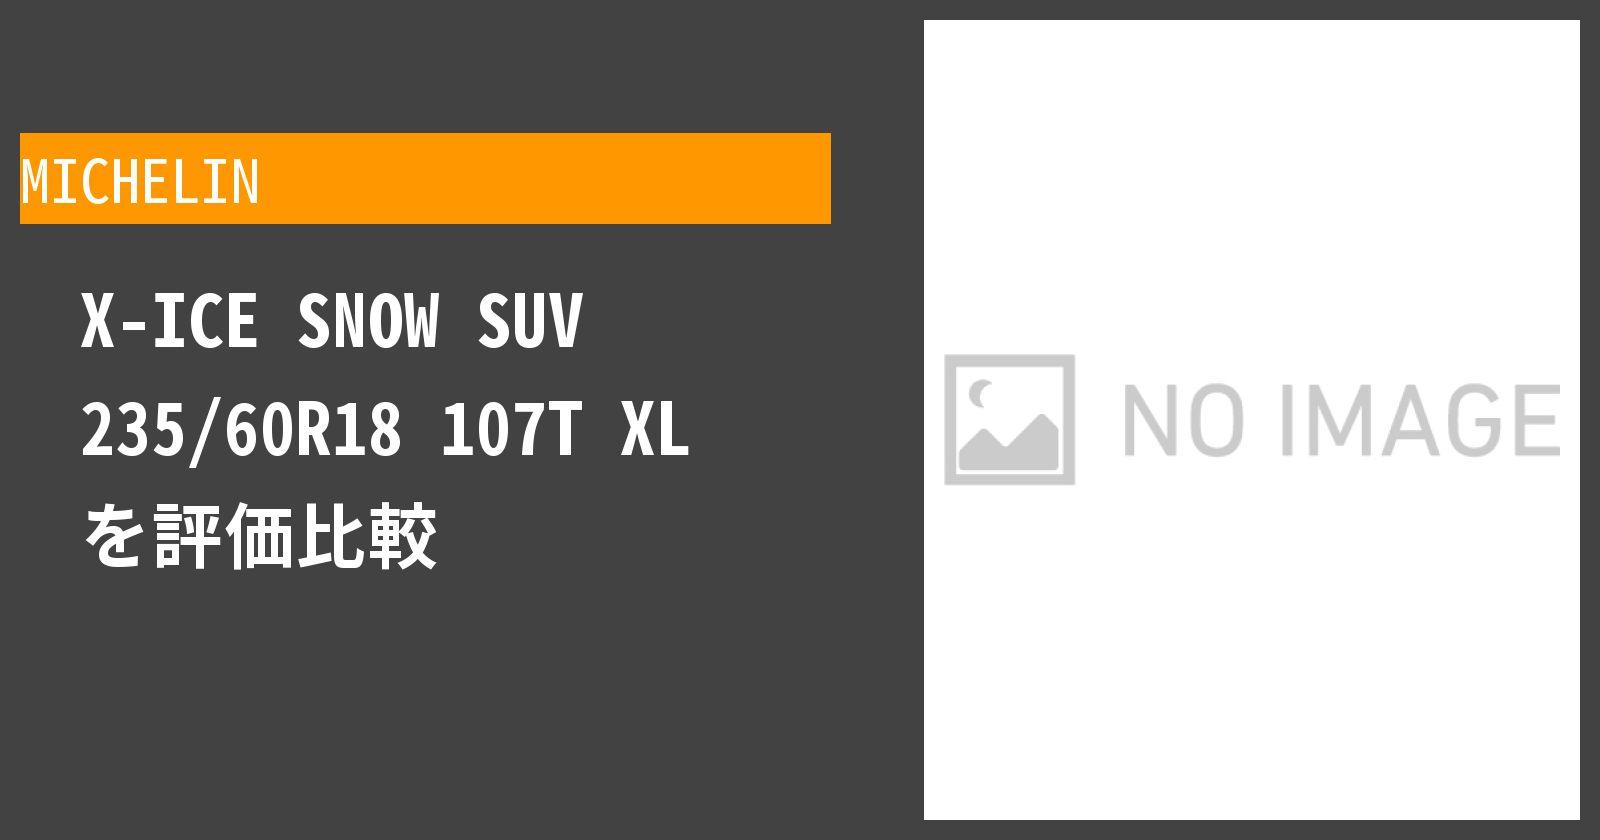 X-ICE SNOW SUV 235/60R18 107T XLを徹底評価